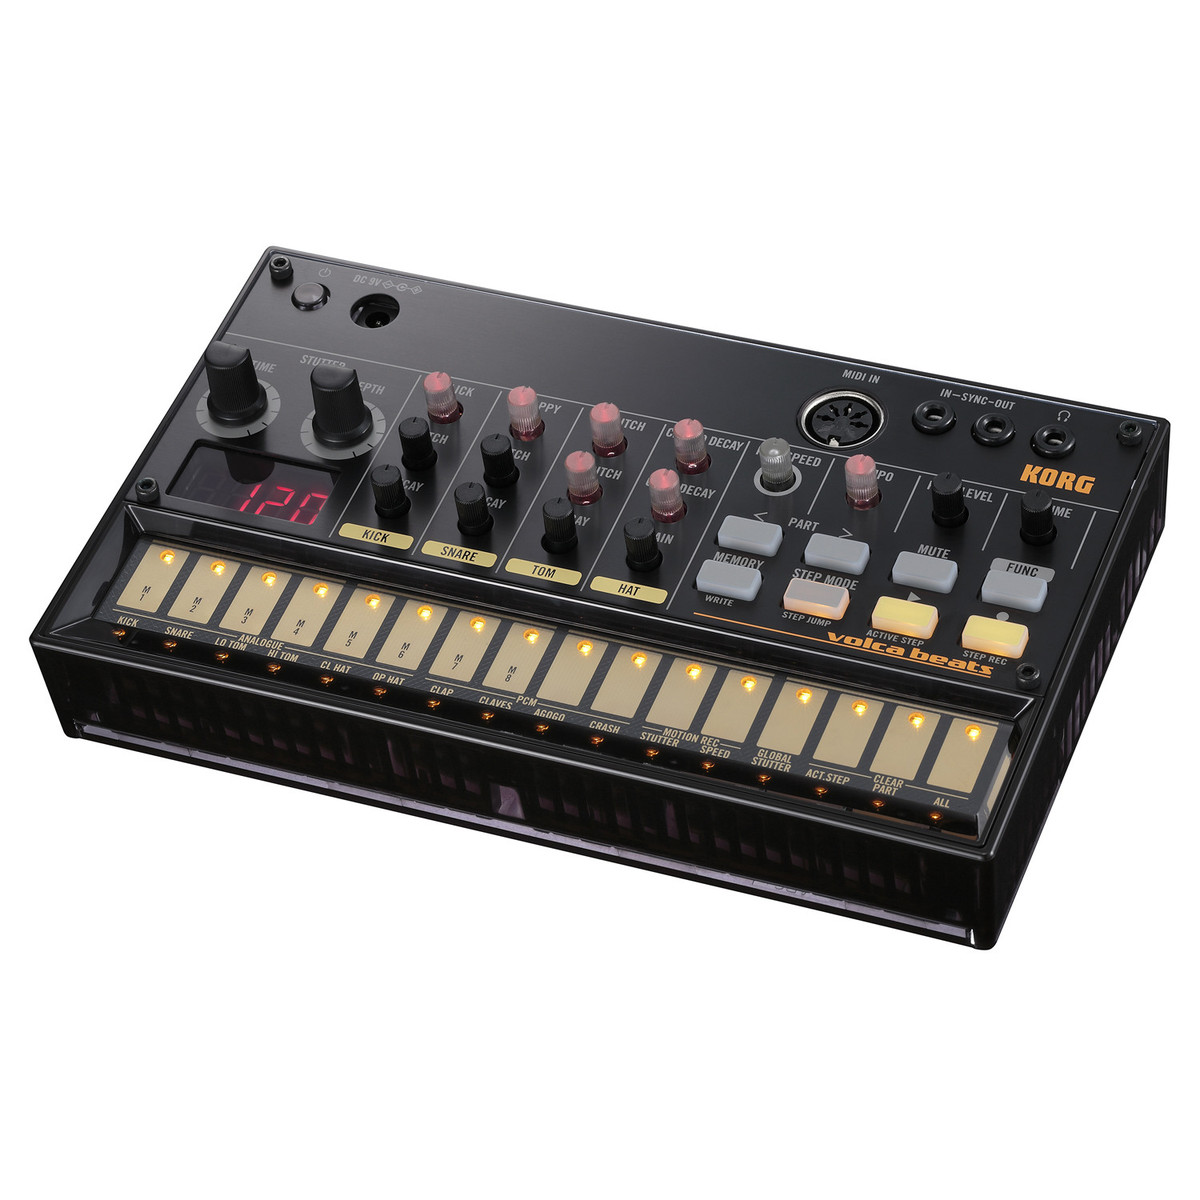 Image of Korg Volca Beats Analog Rhythm Machine